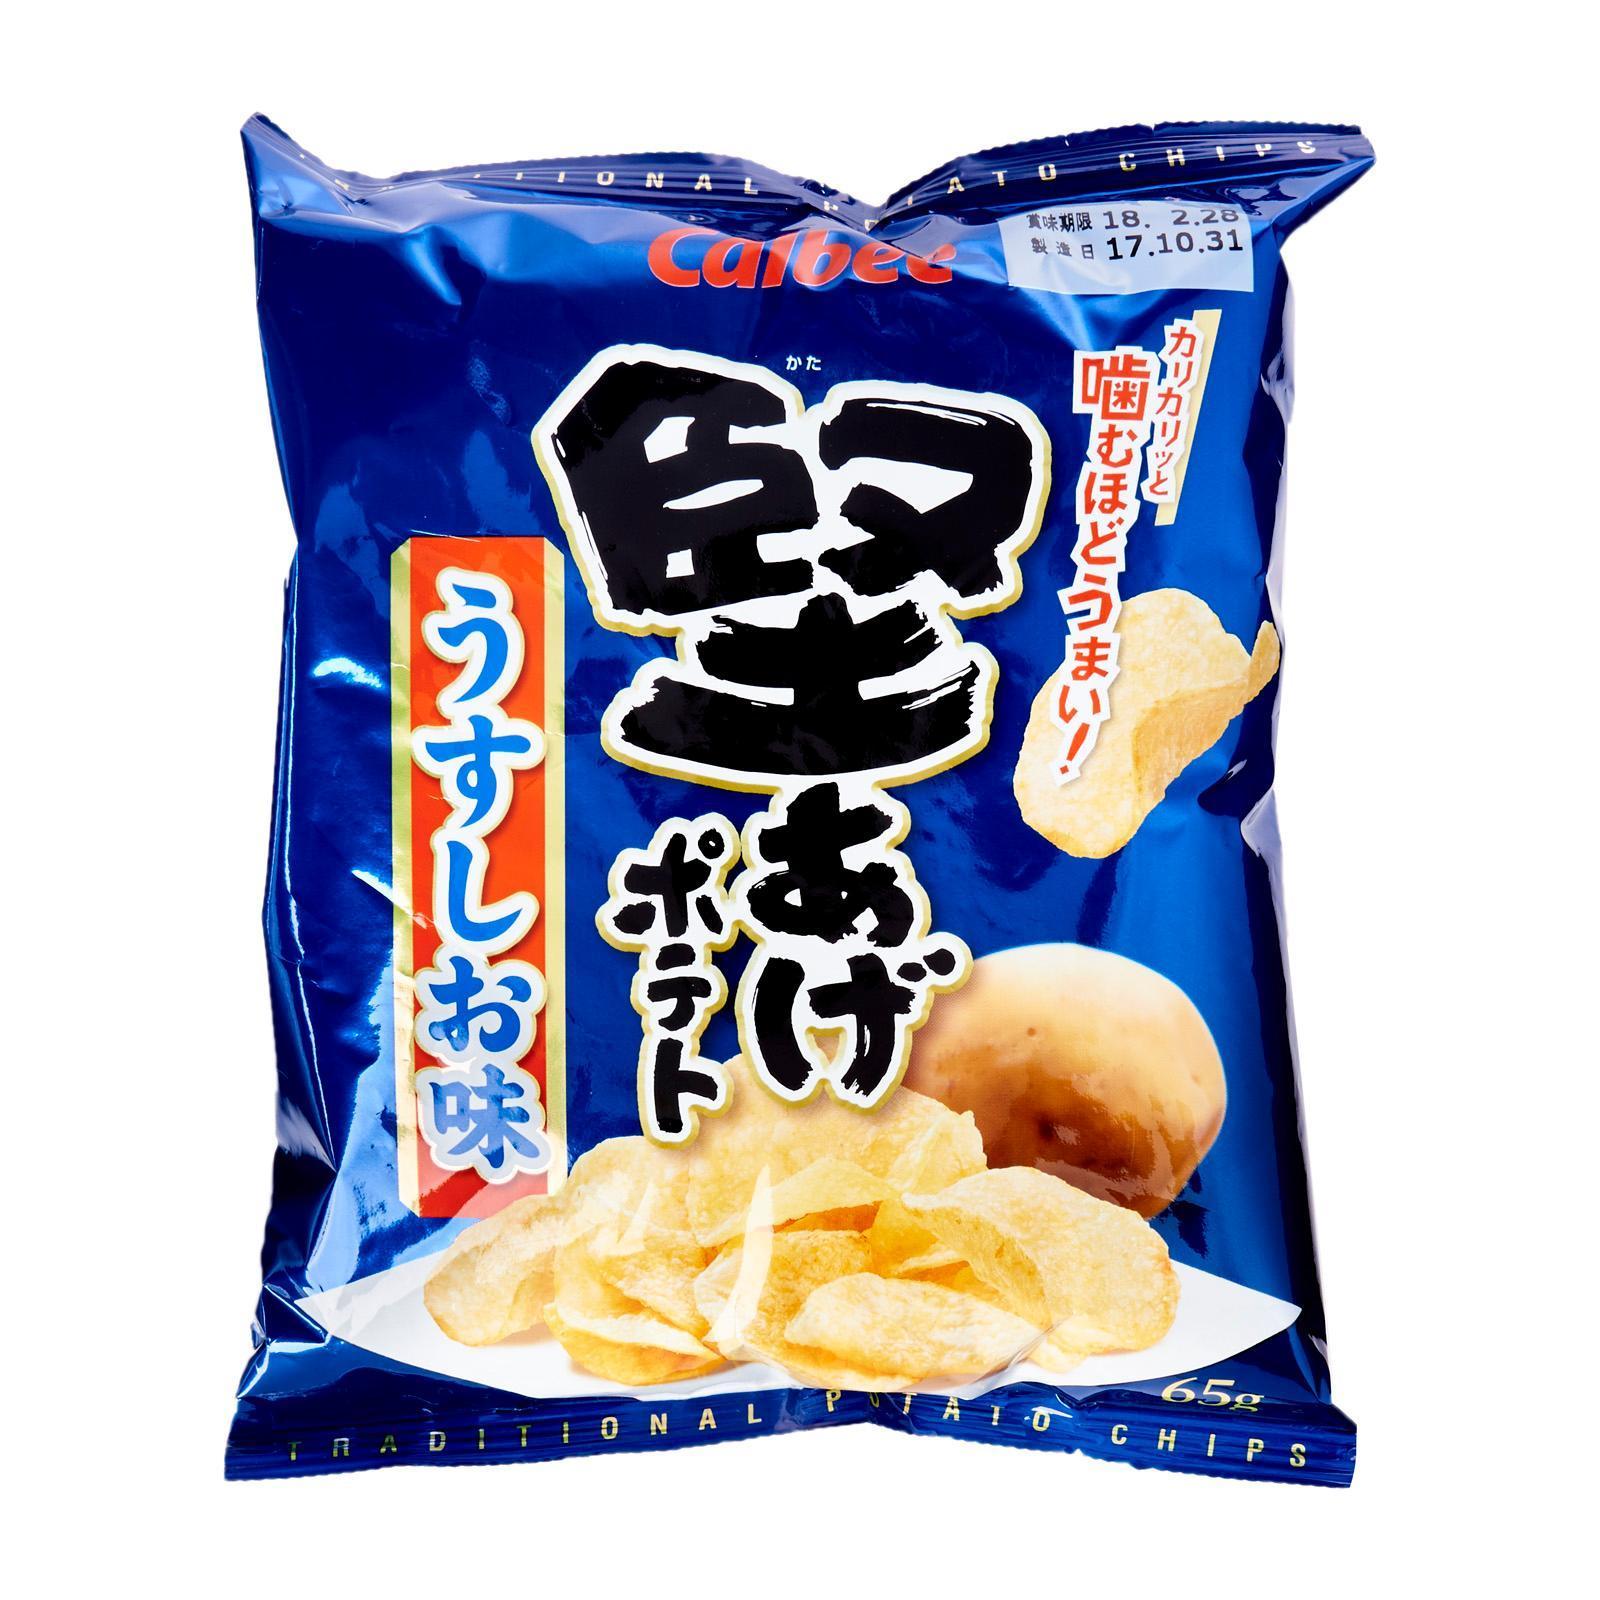 Calbee Kataage Salted Potato Snack